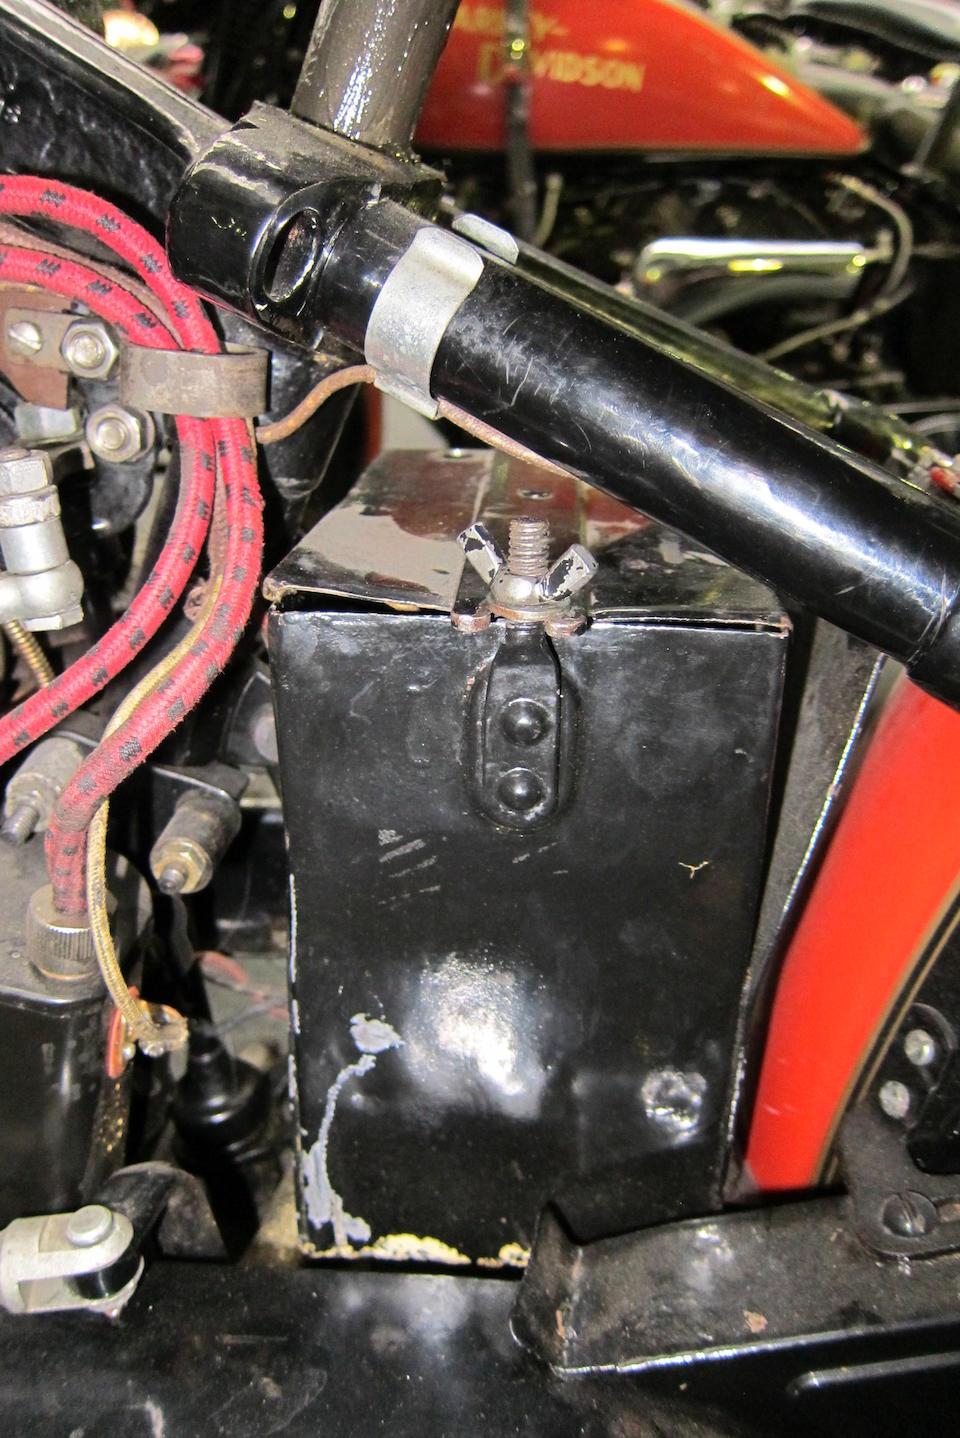 1931 Harley-Davidson 74ci Model V 'Big Twin Frame no. 31V1817 Engine no. 31V1817